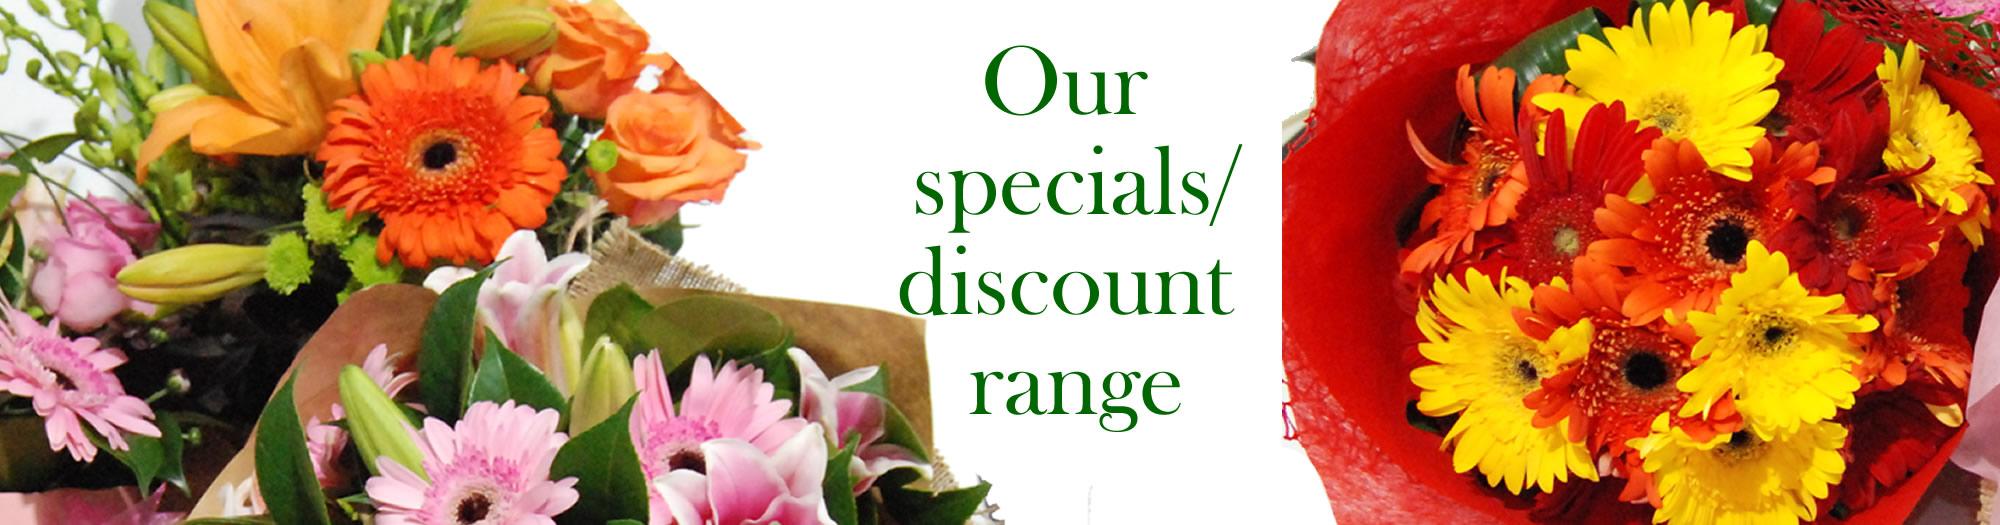 Angkor flowers- special range